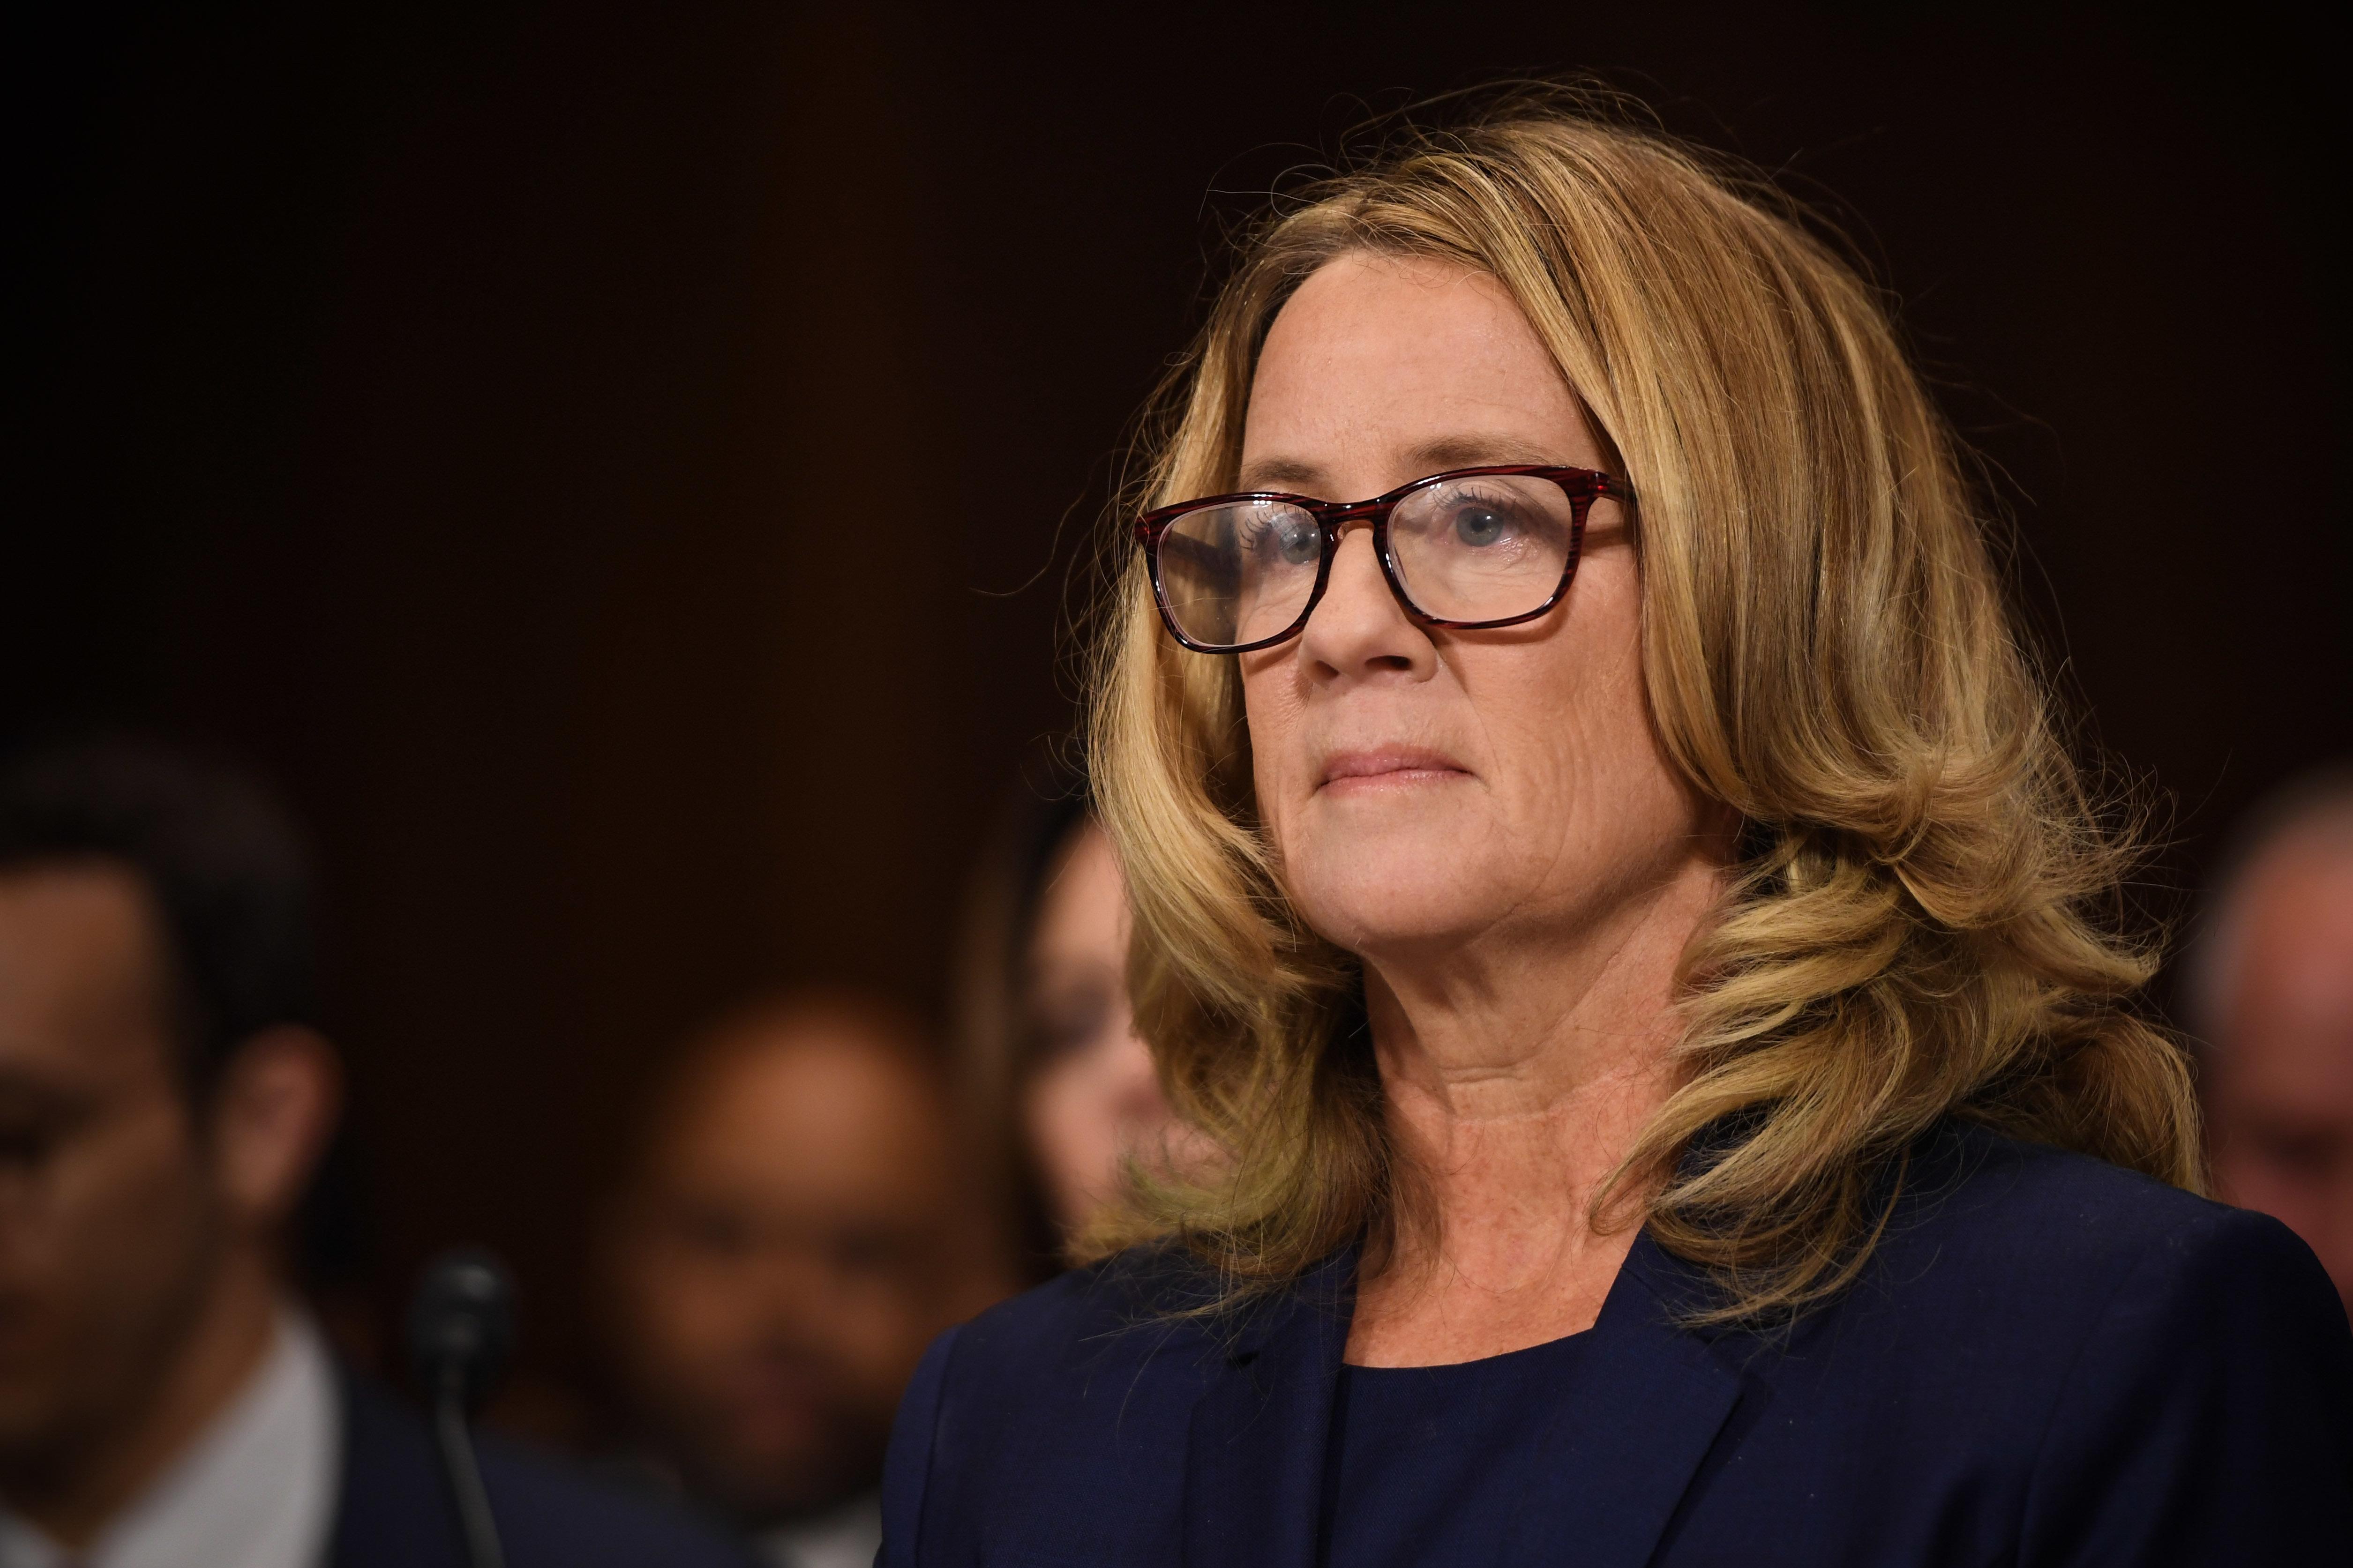 Brett Kavanaugh Accuser Christine Blasey Ford Testifies At Historic Senate